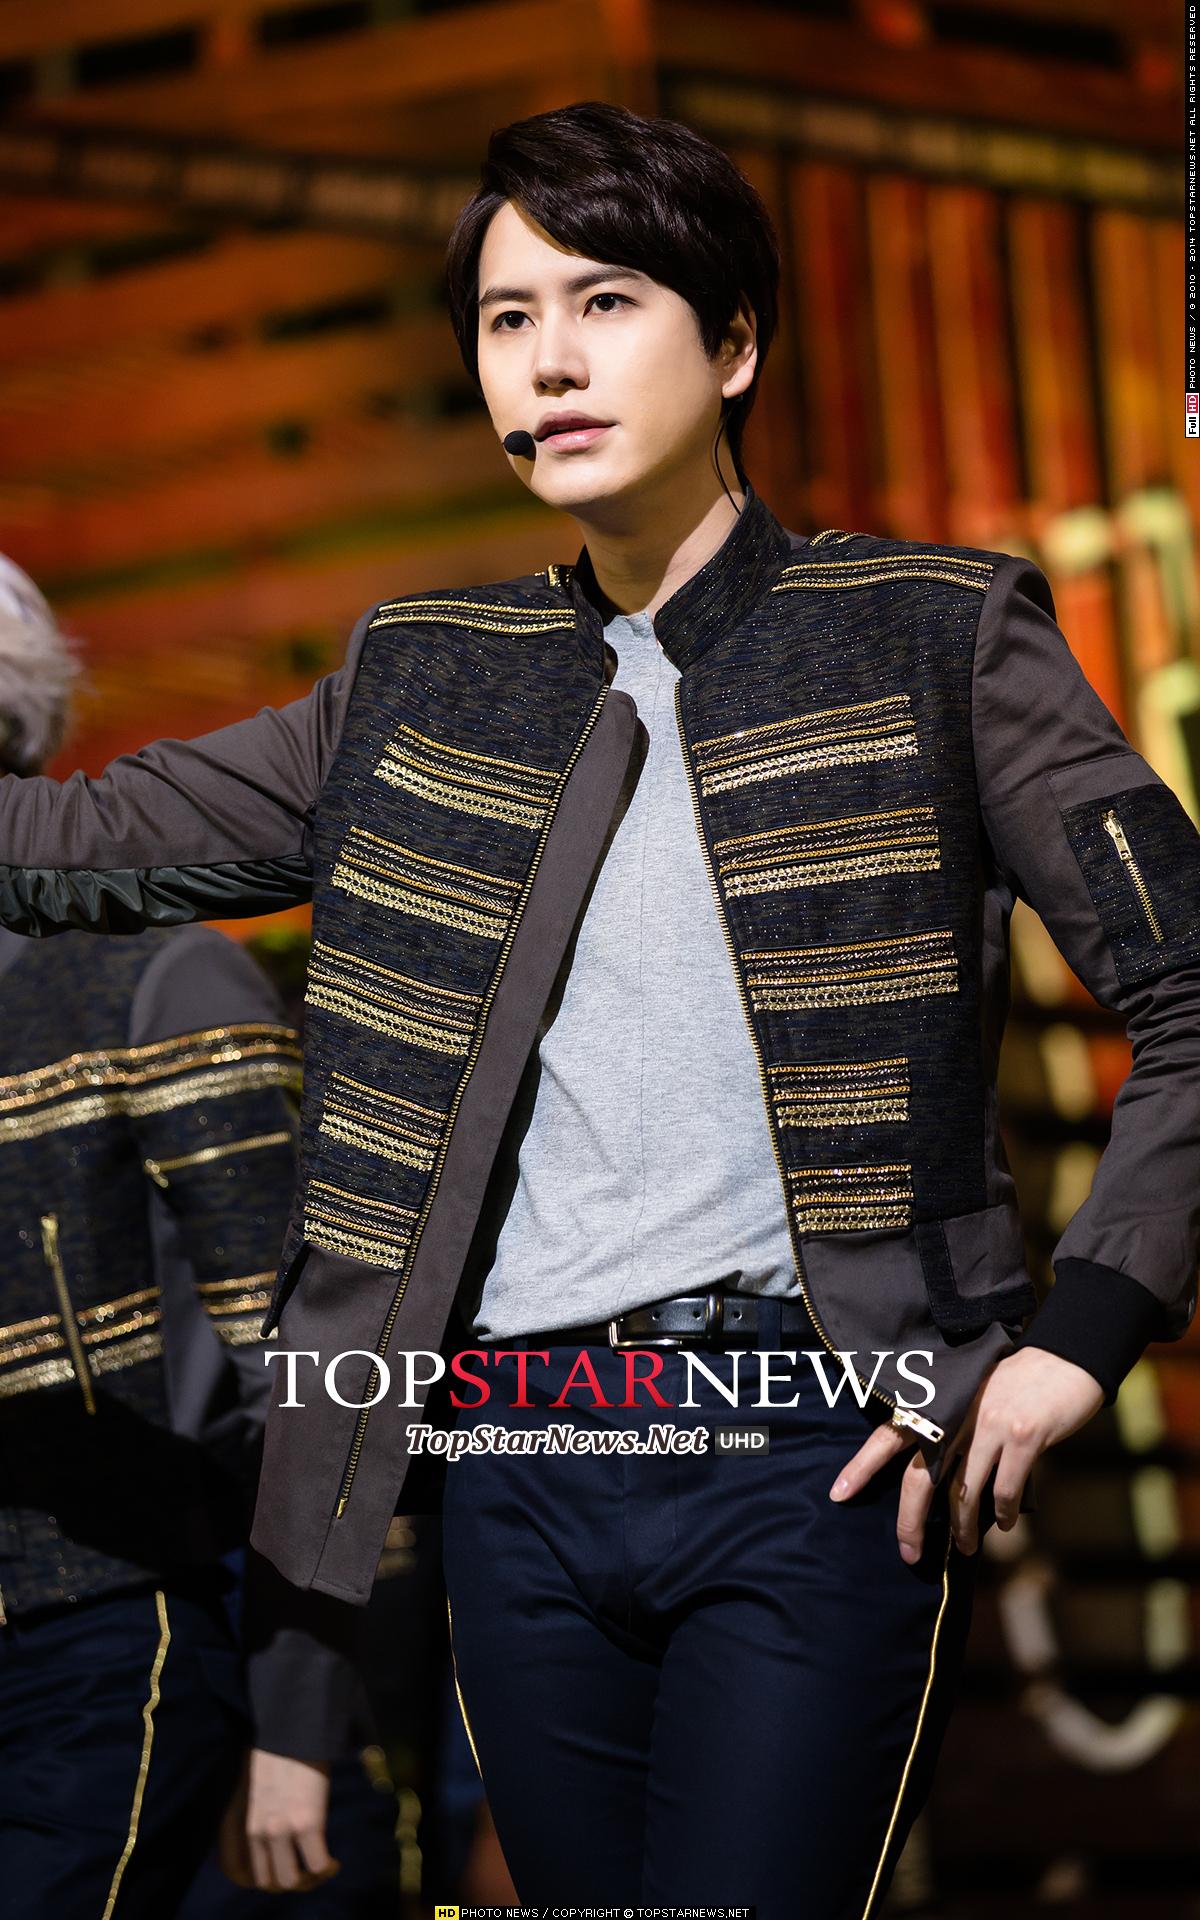 ♥ Super Junior 圭賢(규현)  「SJ 的主唱圭賢也是賢 Line 的成員啊!」、「看過一場他主演的音樂劇後,就會被他的歌聲吸引。」、「圭賢的聲音很渾厚,非常有辨識度也很好聽。」